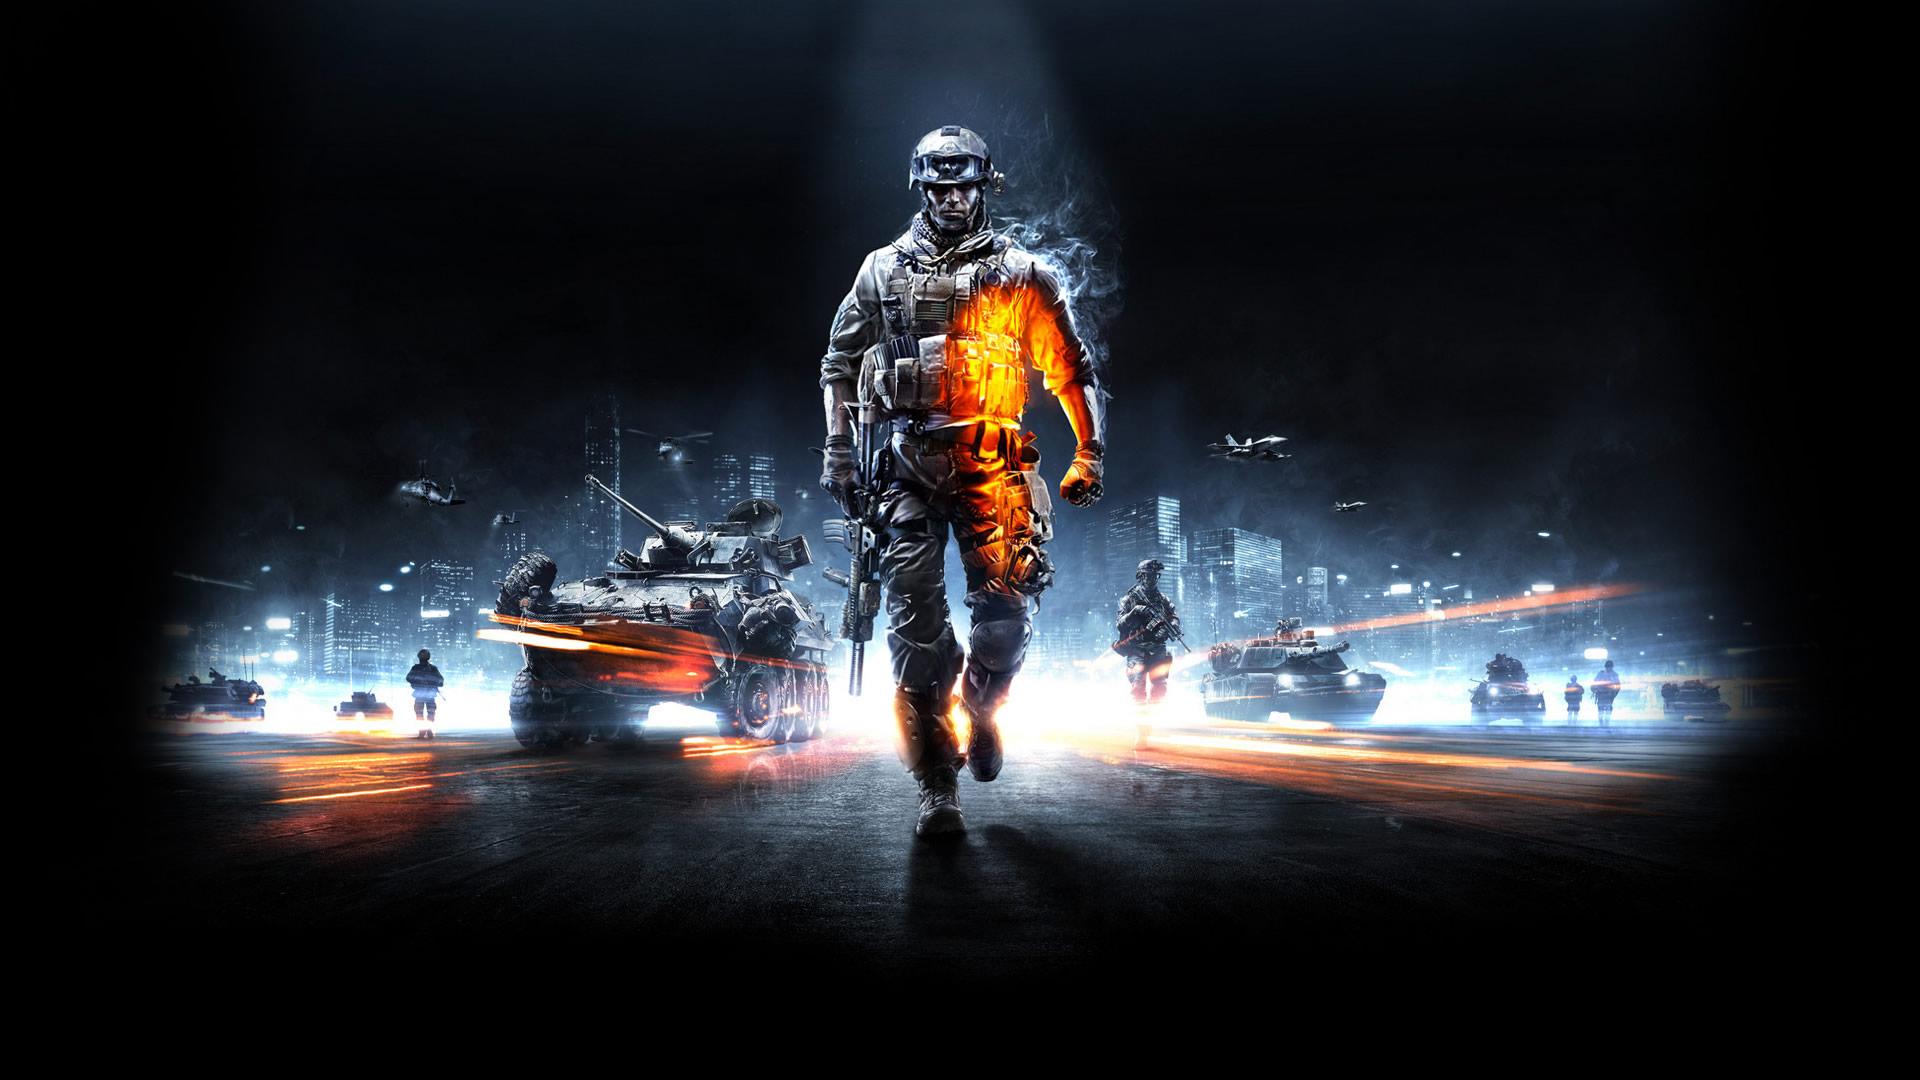 Battlefield-Cool-jpg-×-wallpaper-wp5005074